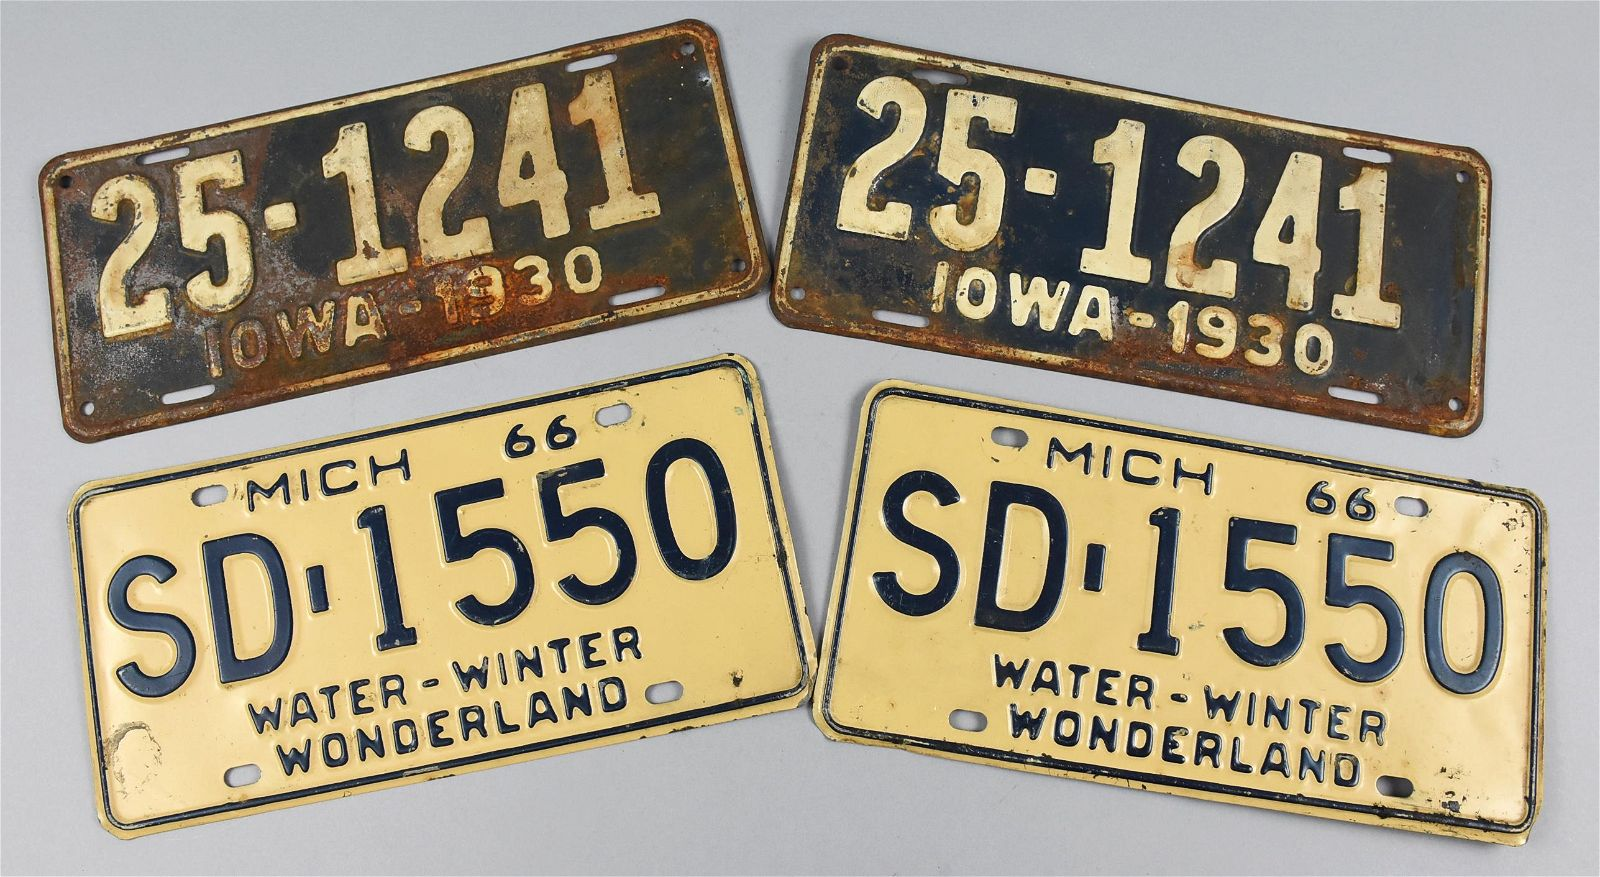 Pair 1930 Iowa Lincense Plate, Pair 1966 Michigan